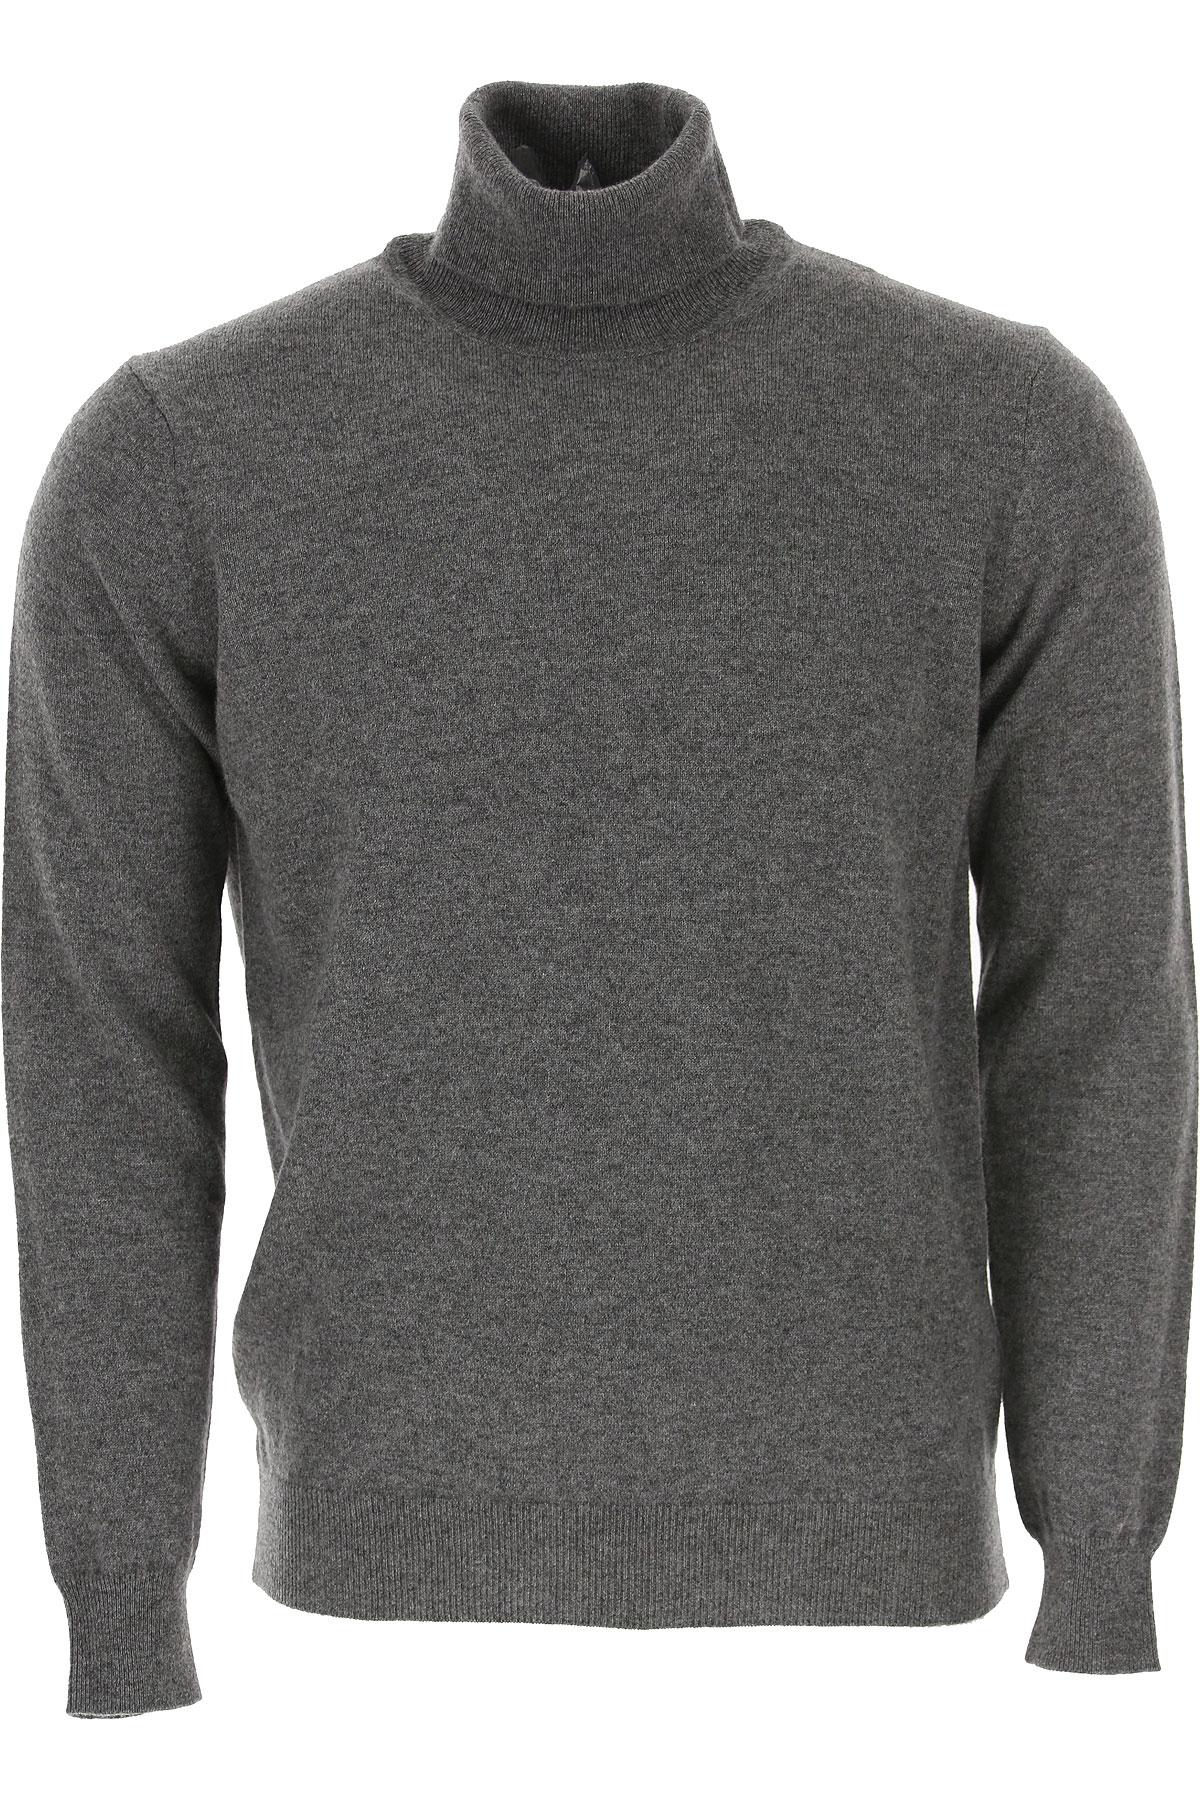 Kangra Sweater for Men Jumper On Sale, Grey, Cashemere, 2019, L M XL XXL